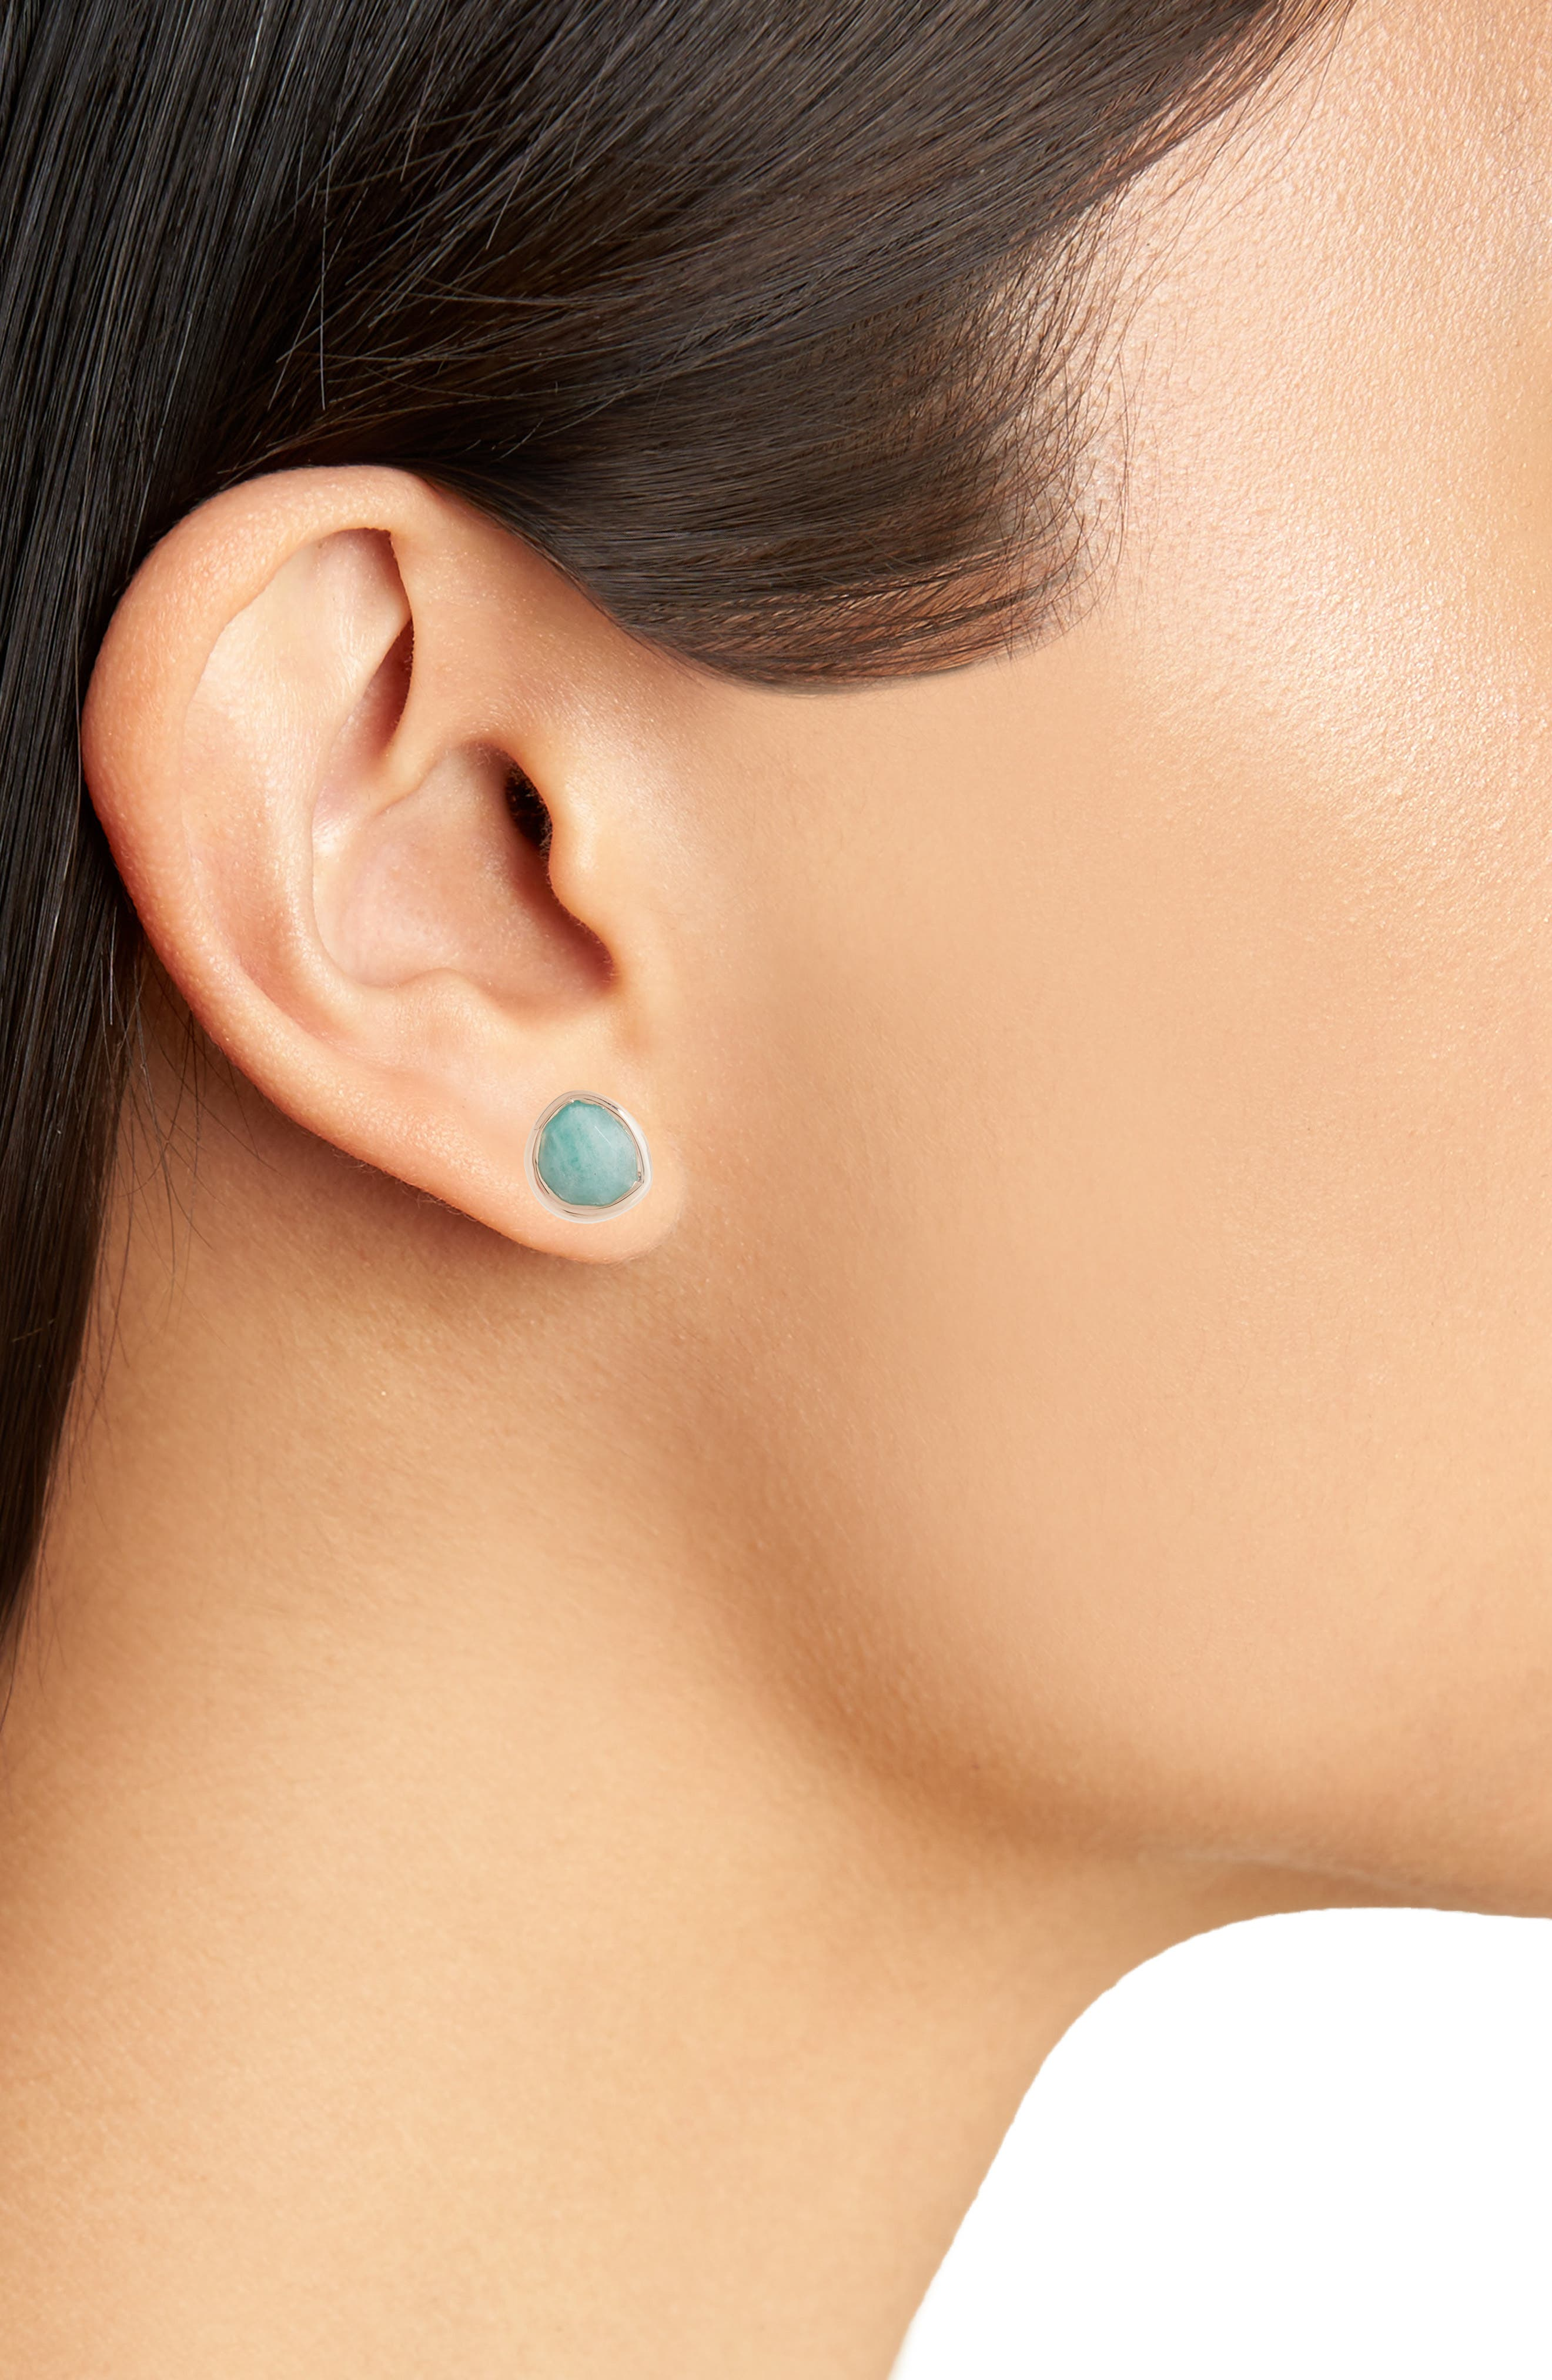 'Siren' Semiprecious Stone Stud Earrings,                             Alternate thumbnail 2, color,                             AMAZONITE/ ROSE GOLD